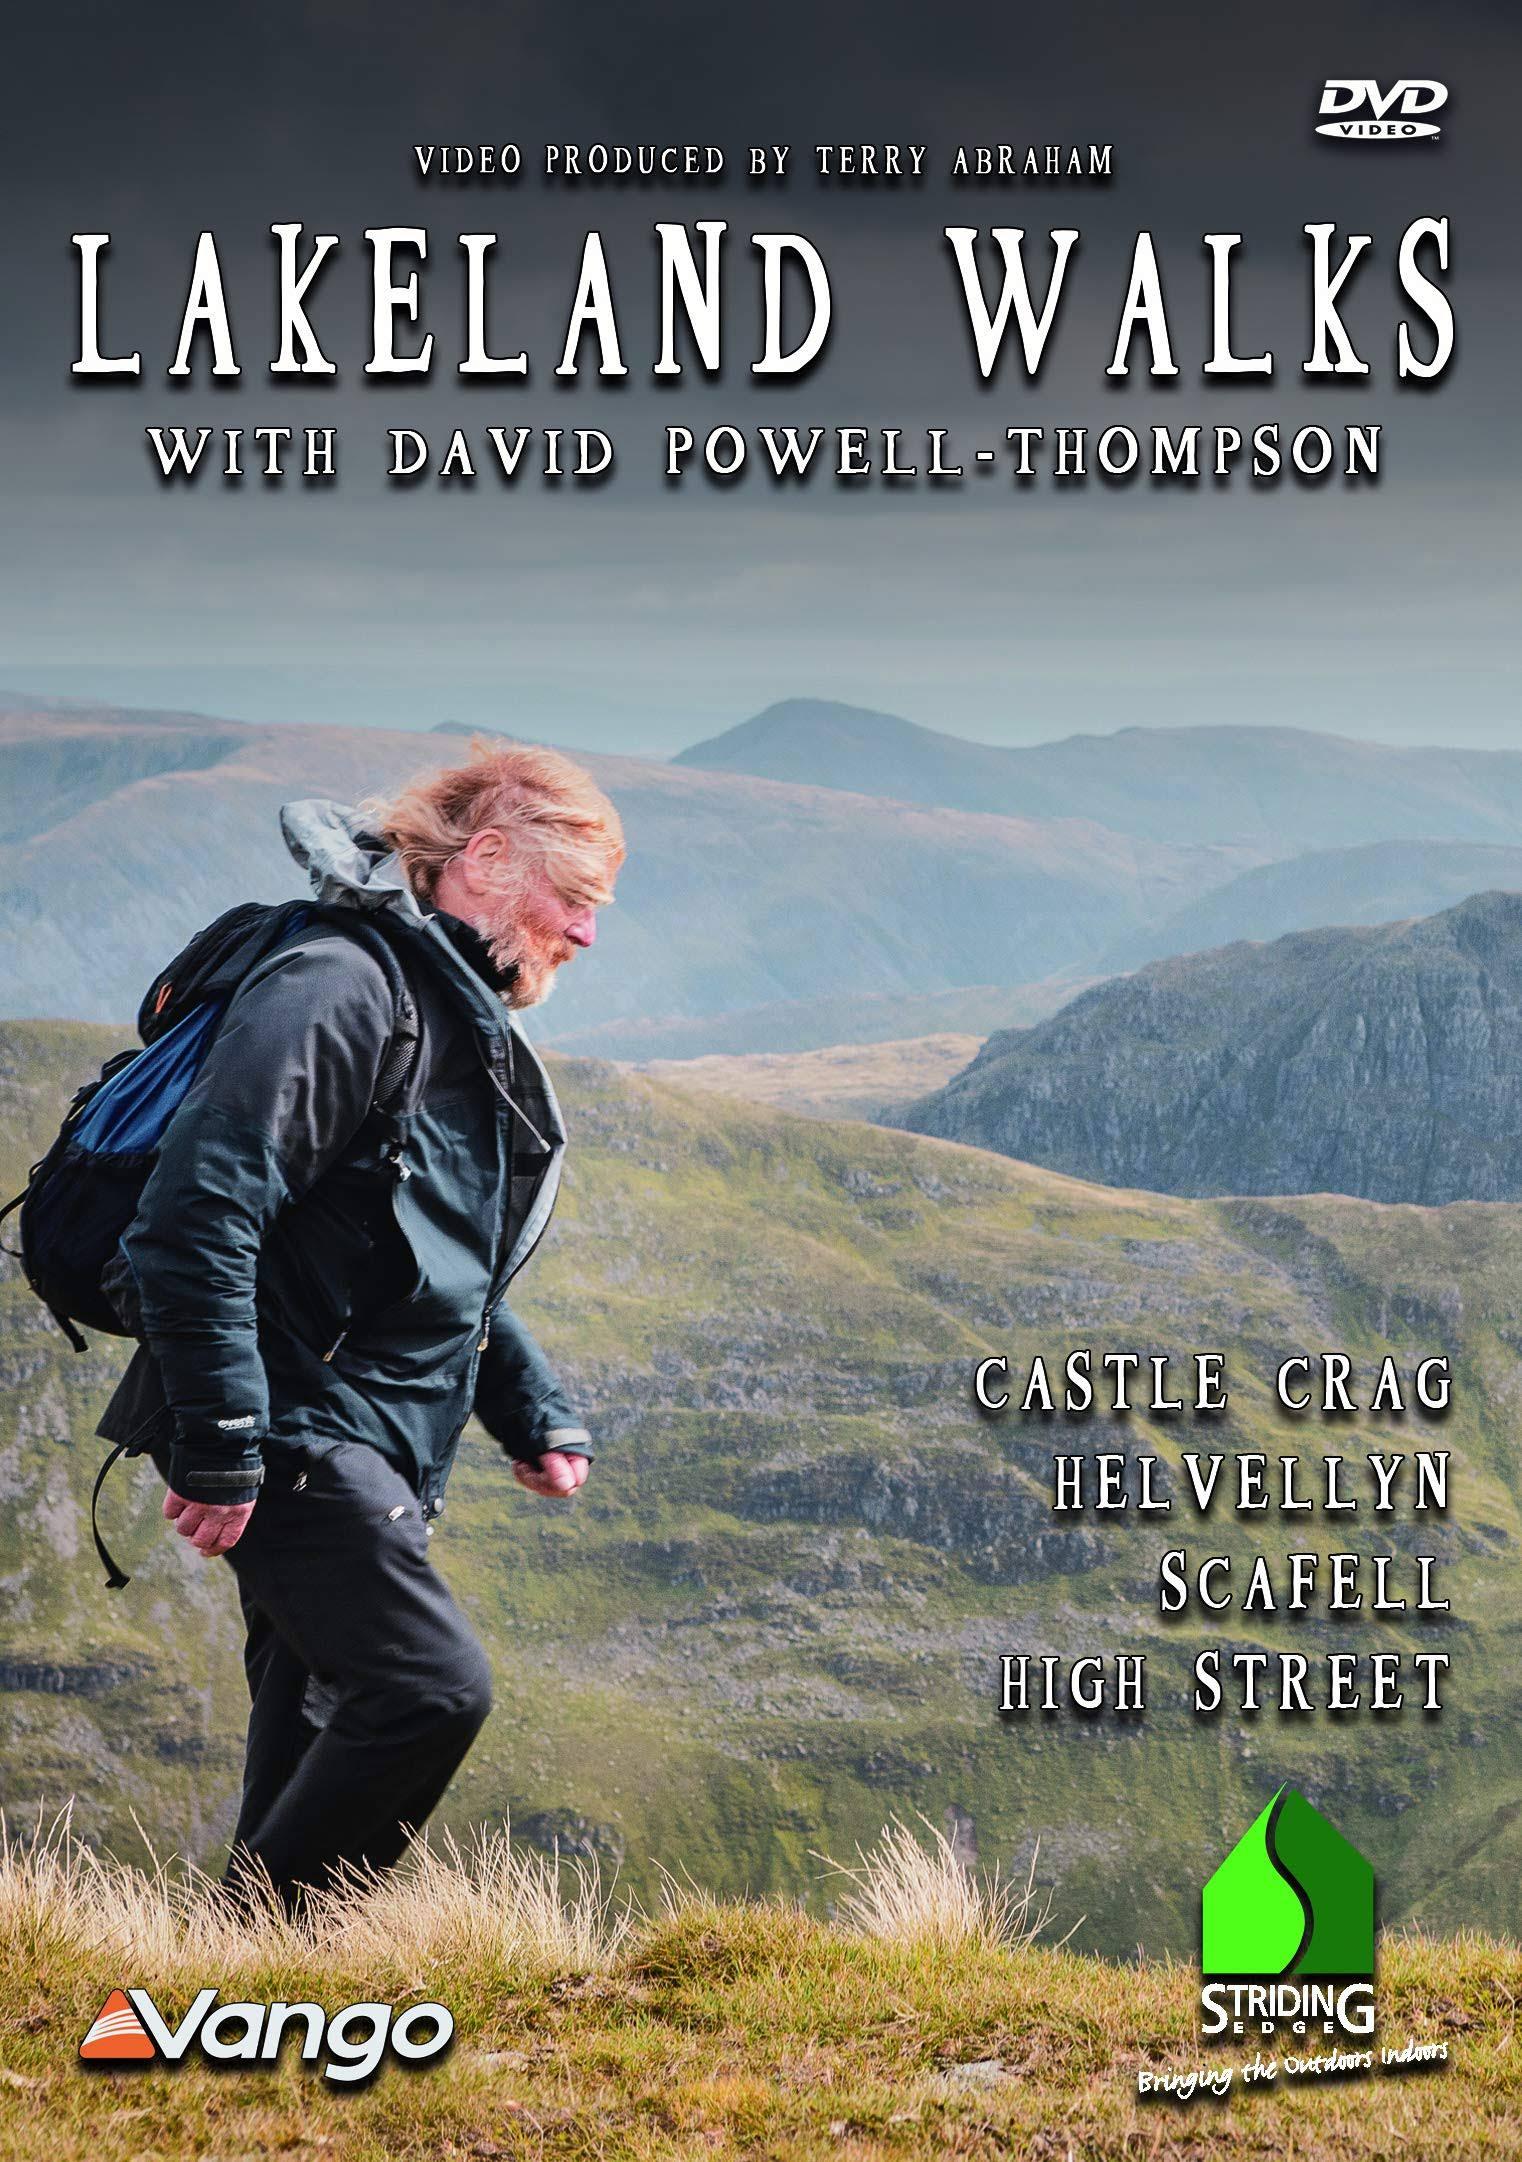 Lakeland Walks with David Powell-Thompson